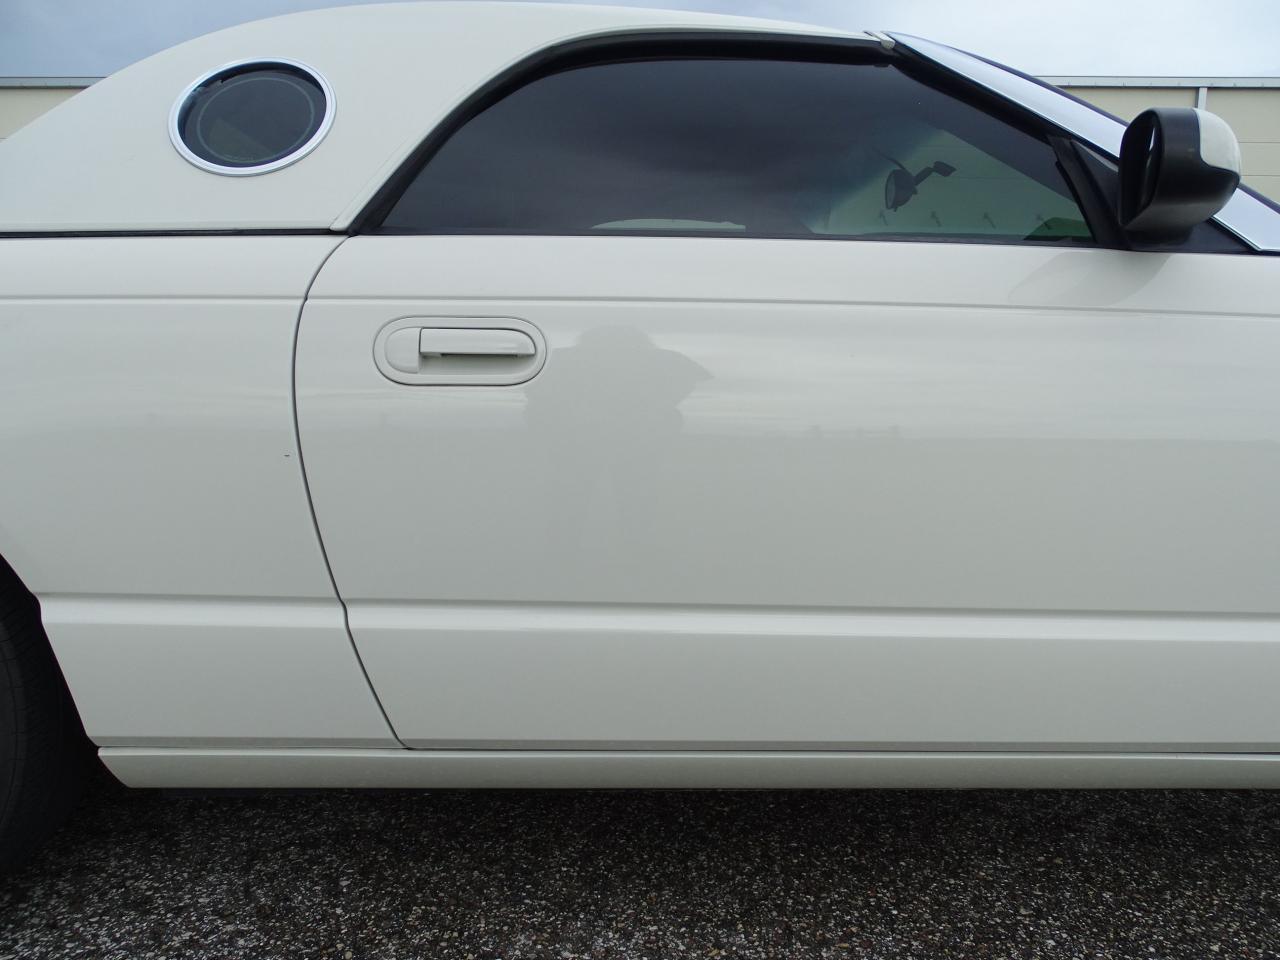 2003 Ford Thunderbird (CC-1342811) for sale in O'Fallon, Illinois